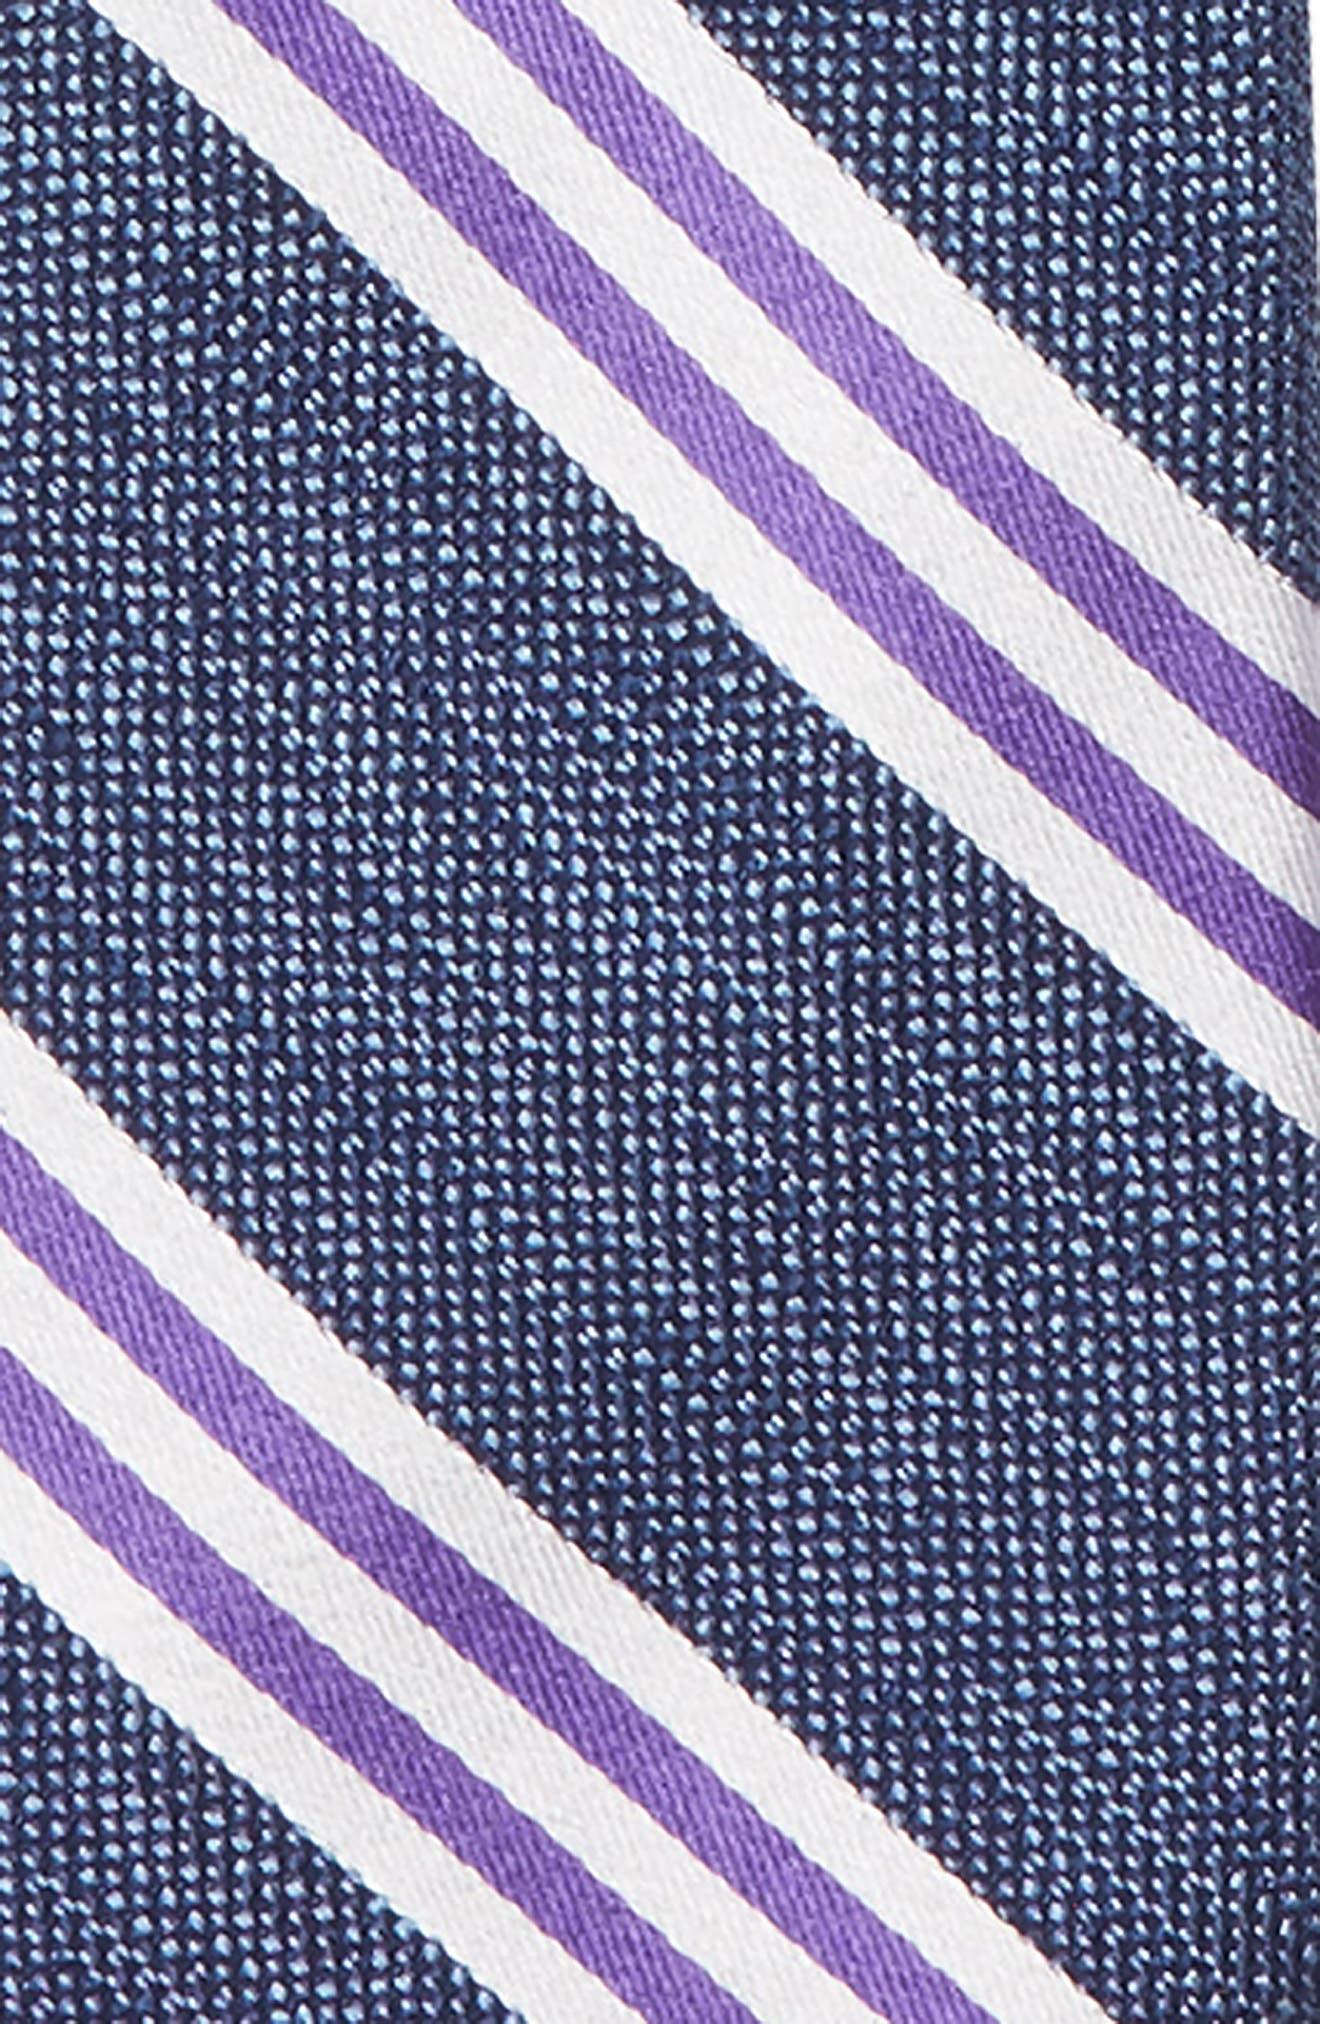 Stripe Silk Zip Tie,                             Alternate thumbnail 2, color,                             PURPLE